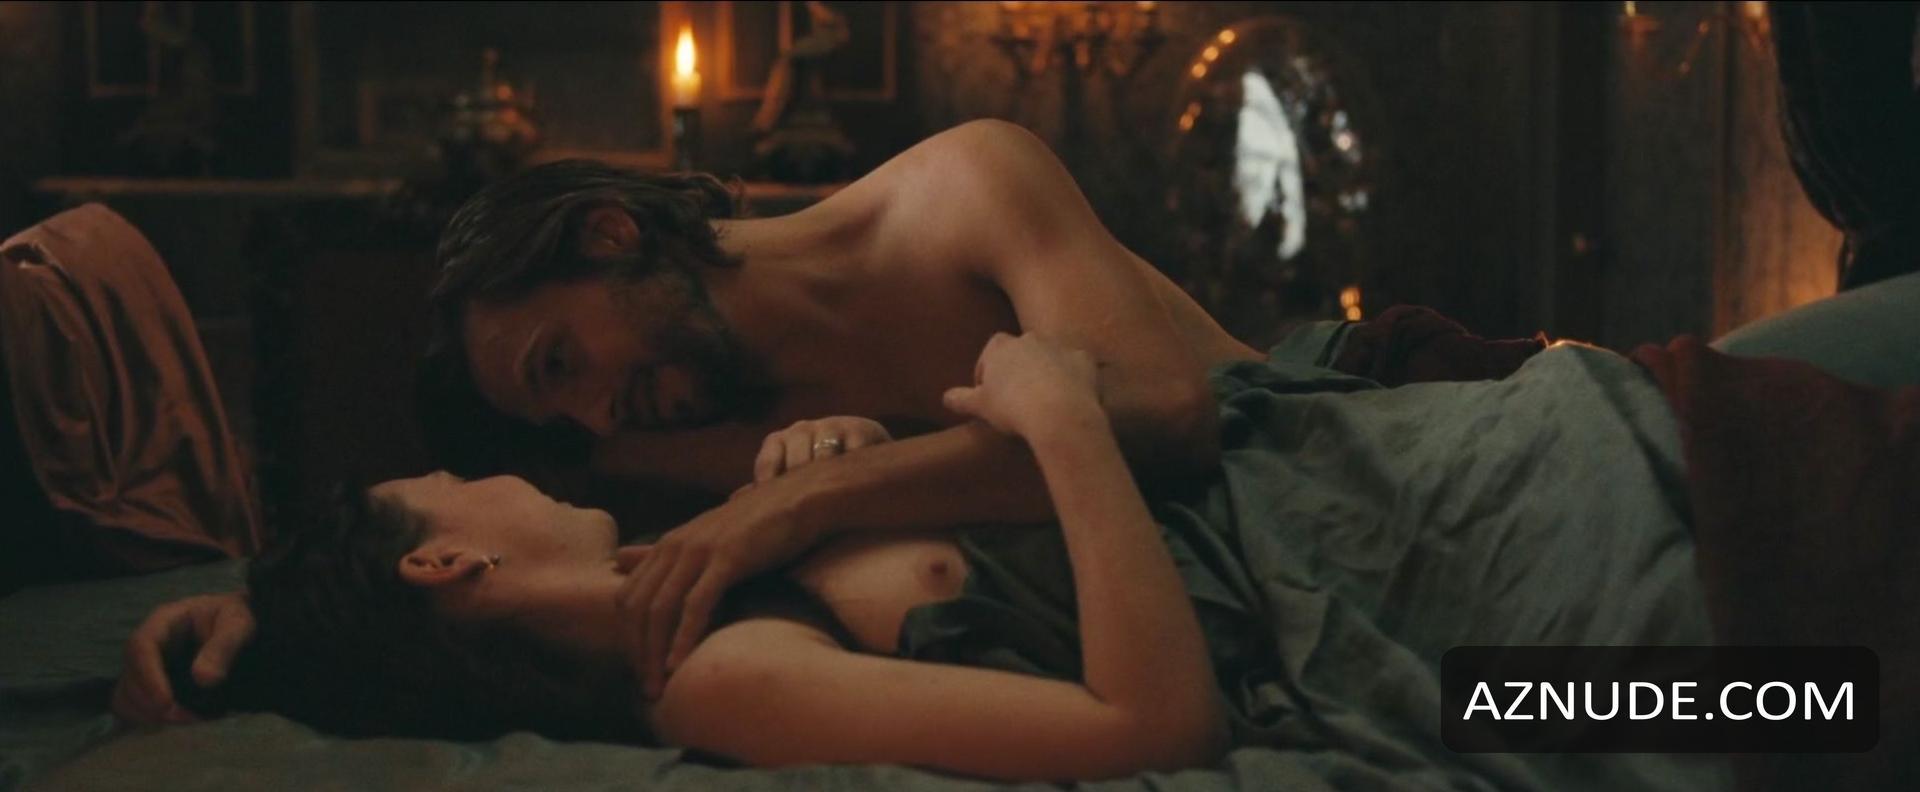 Madame bovary porno